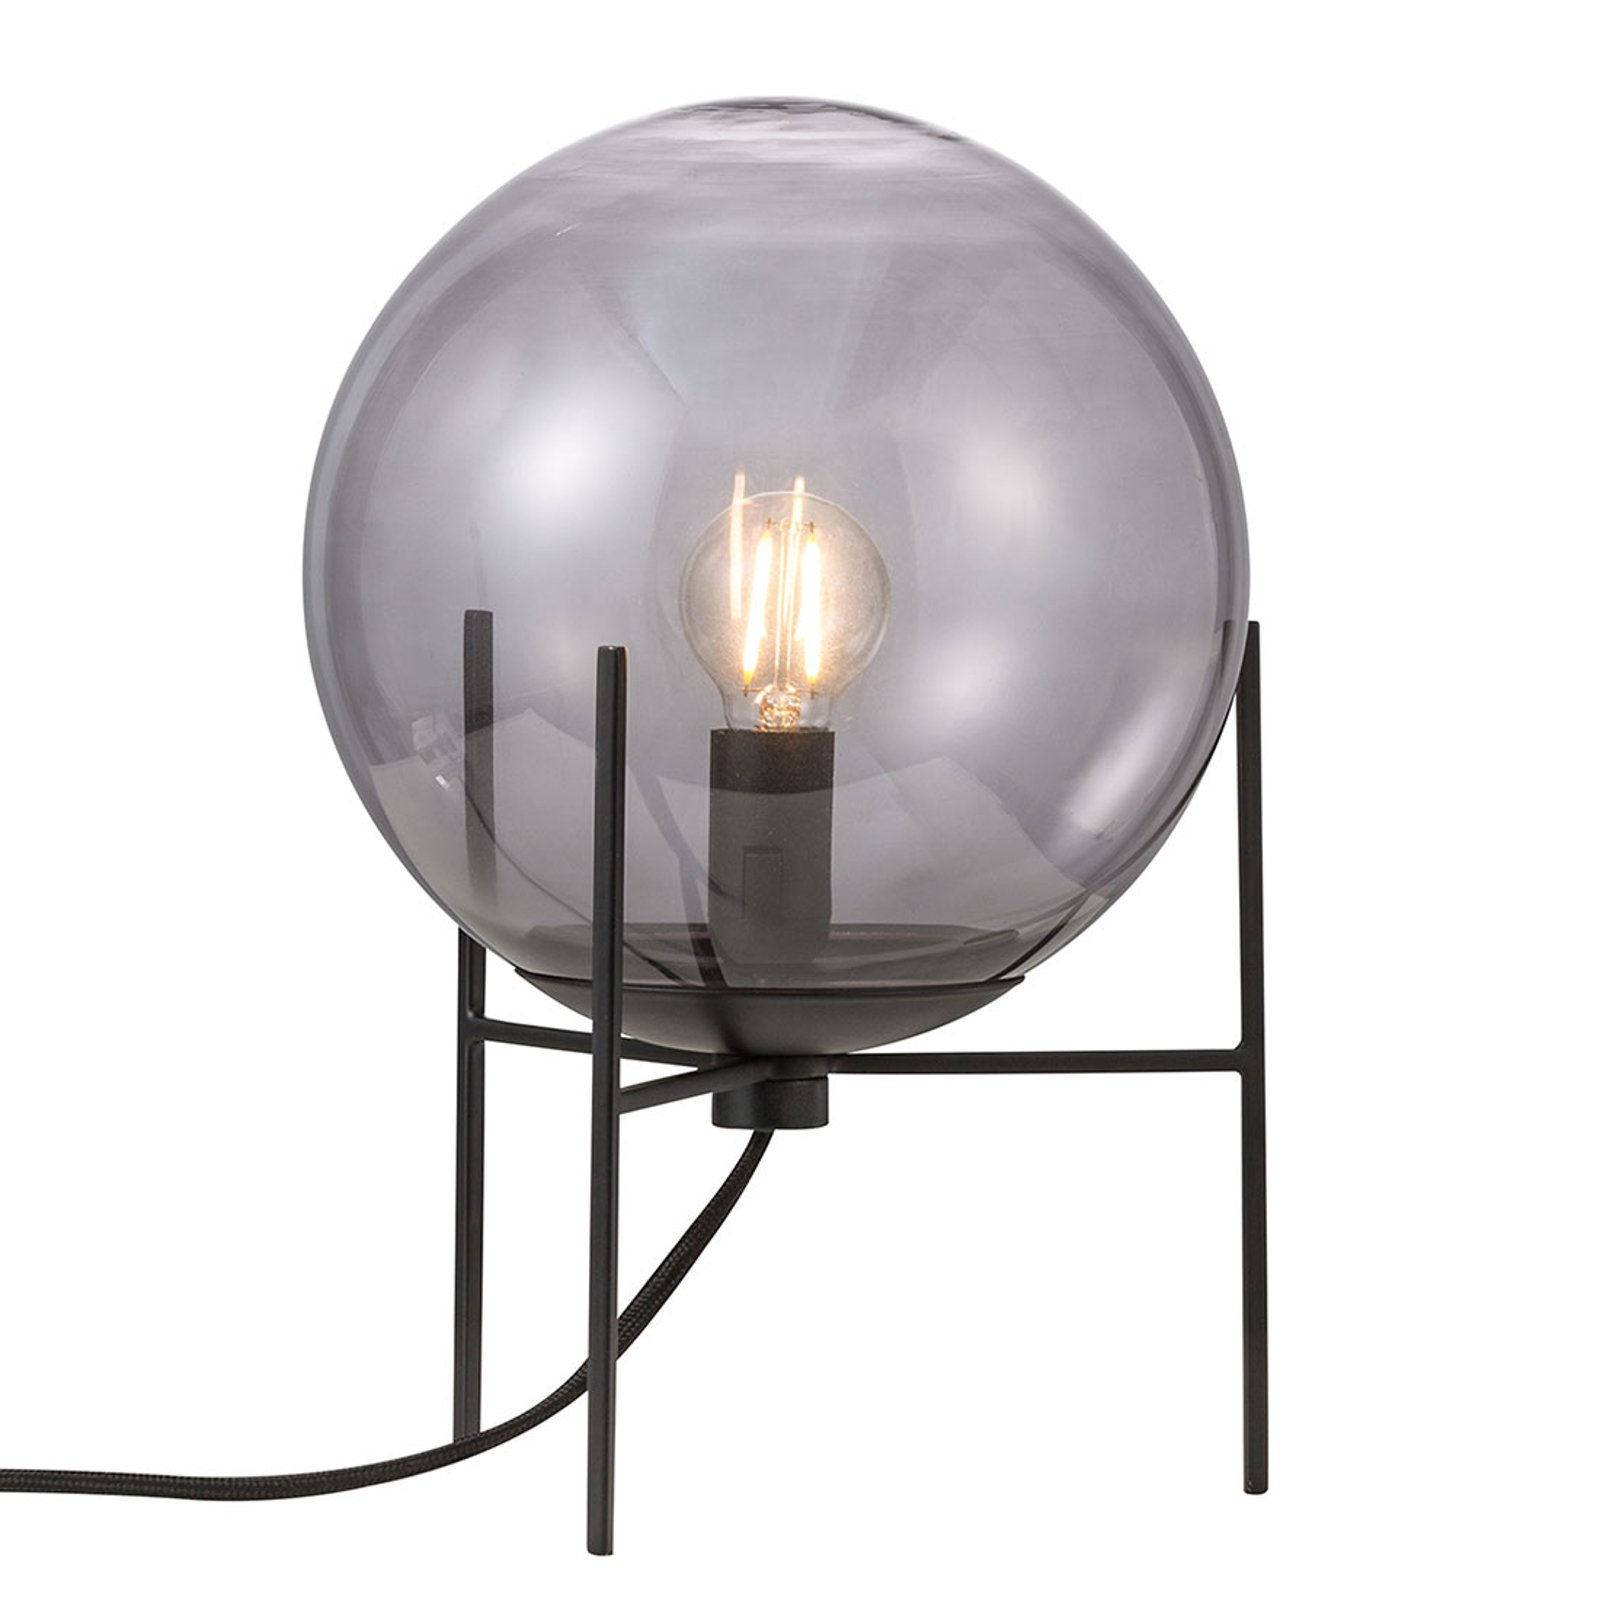 Bordlampe Alton med røykgrå glasskjerm